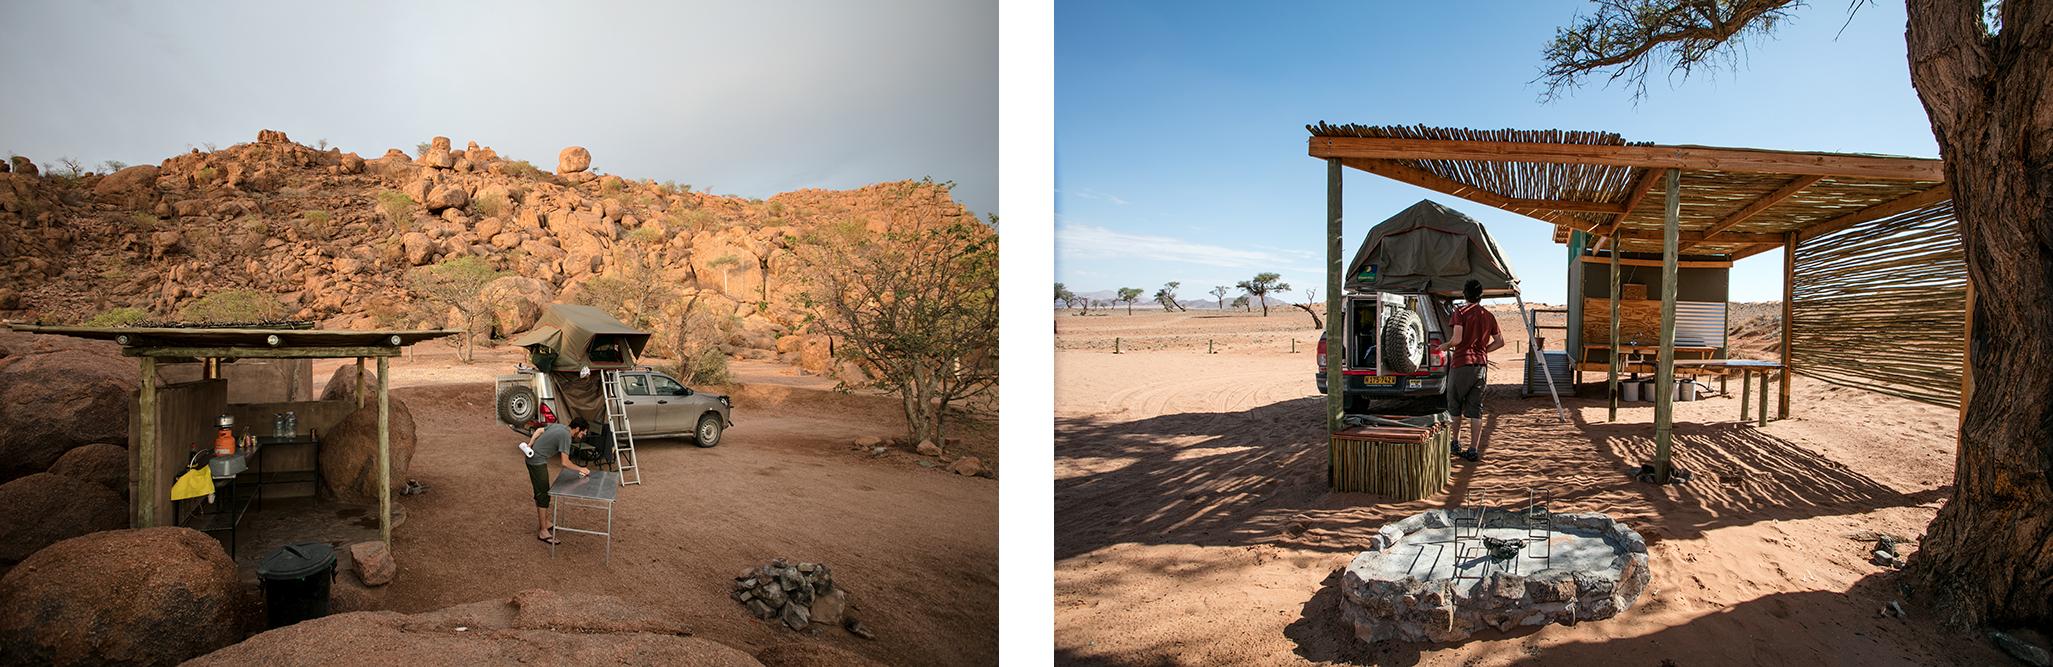 Camper en Namibie